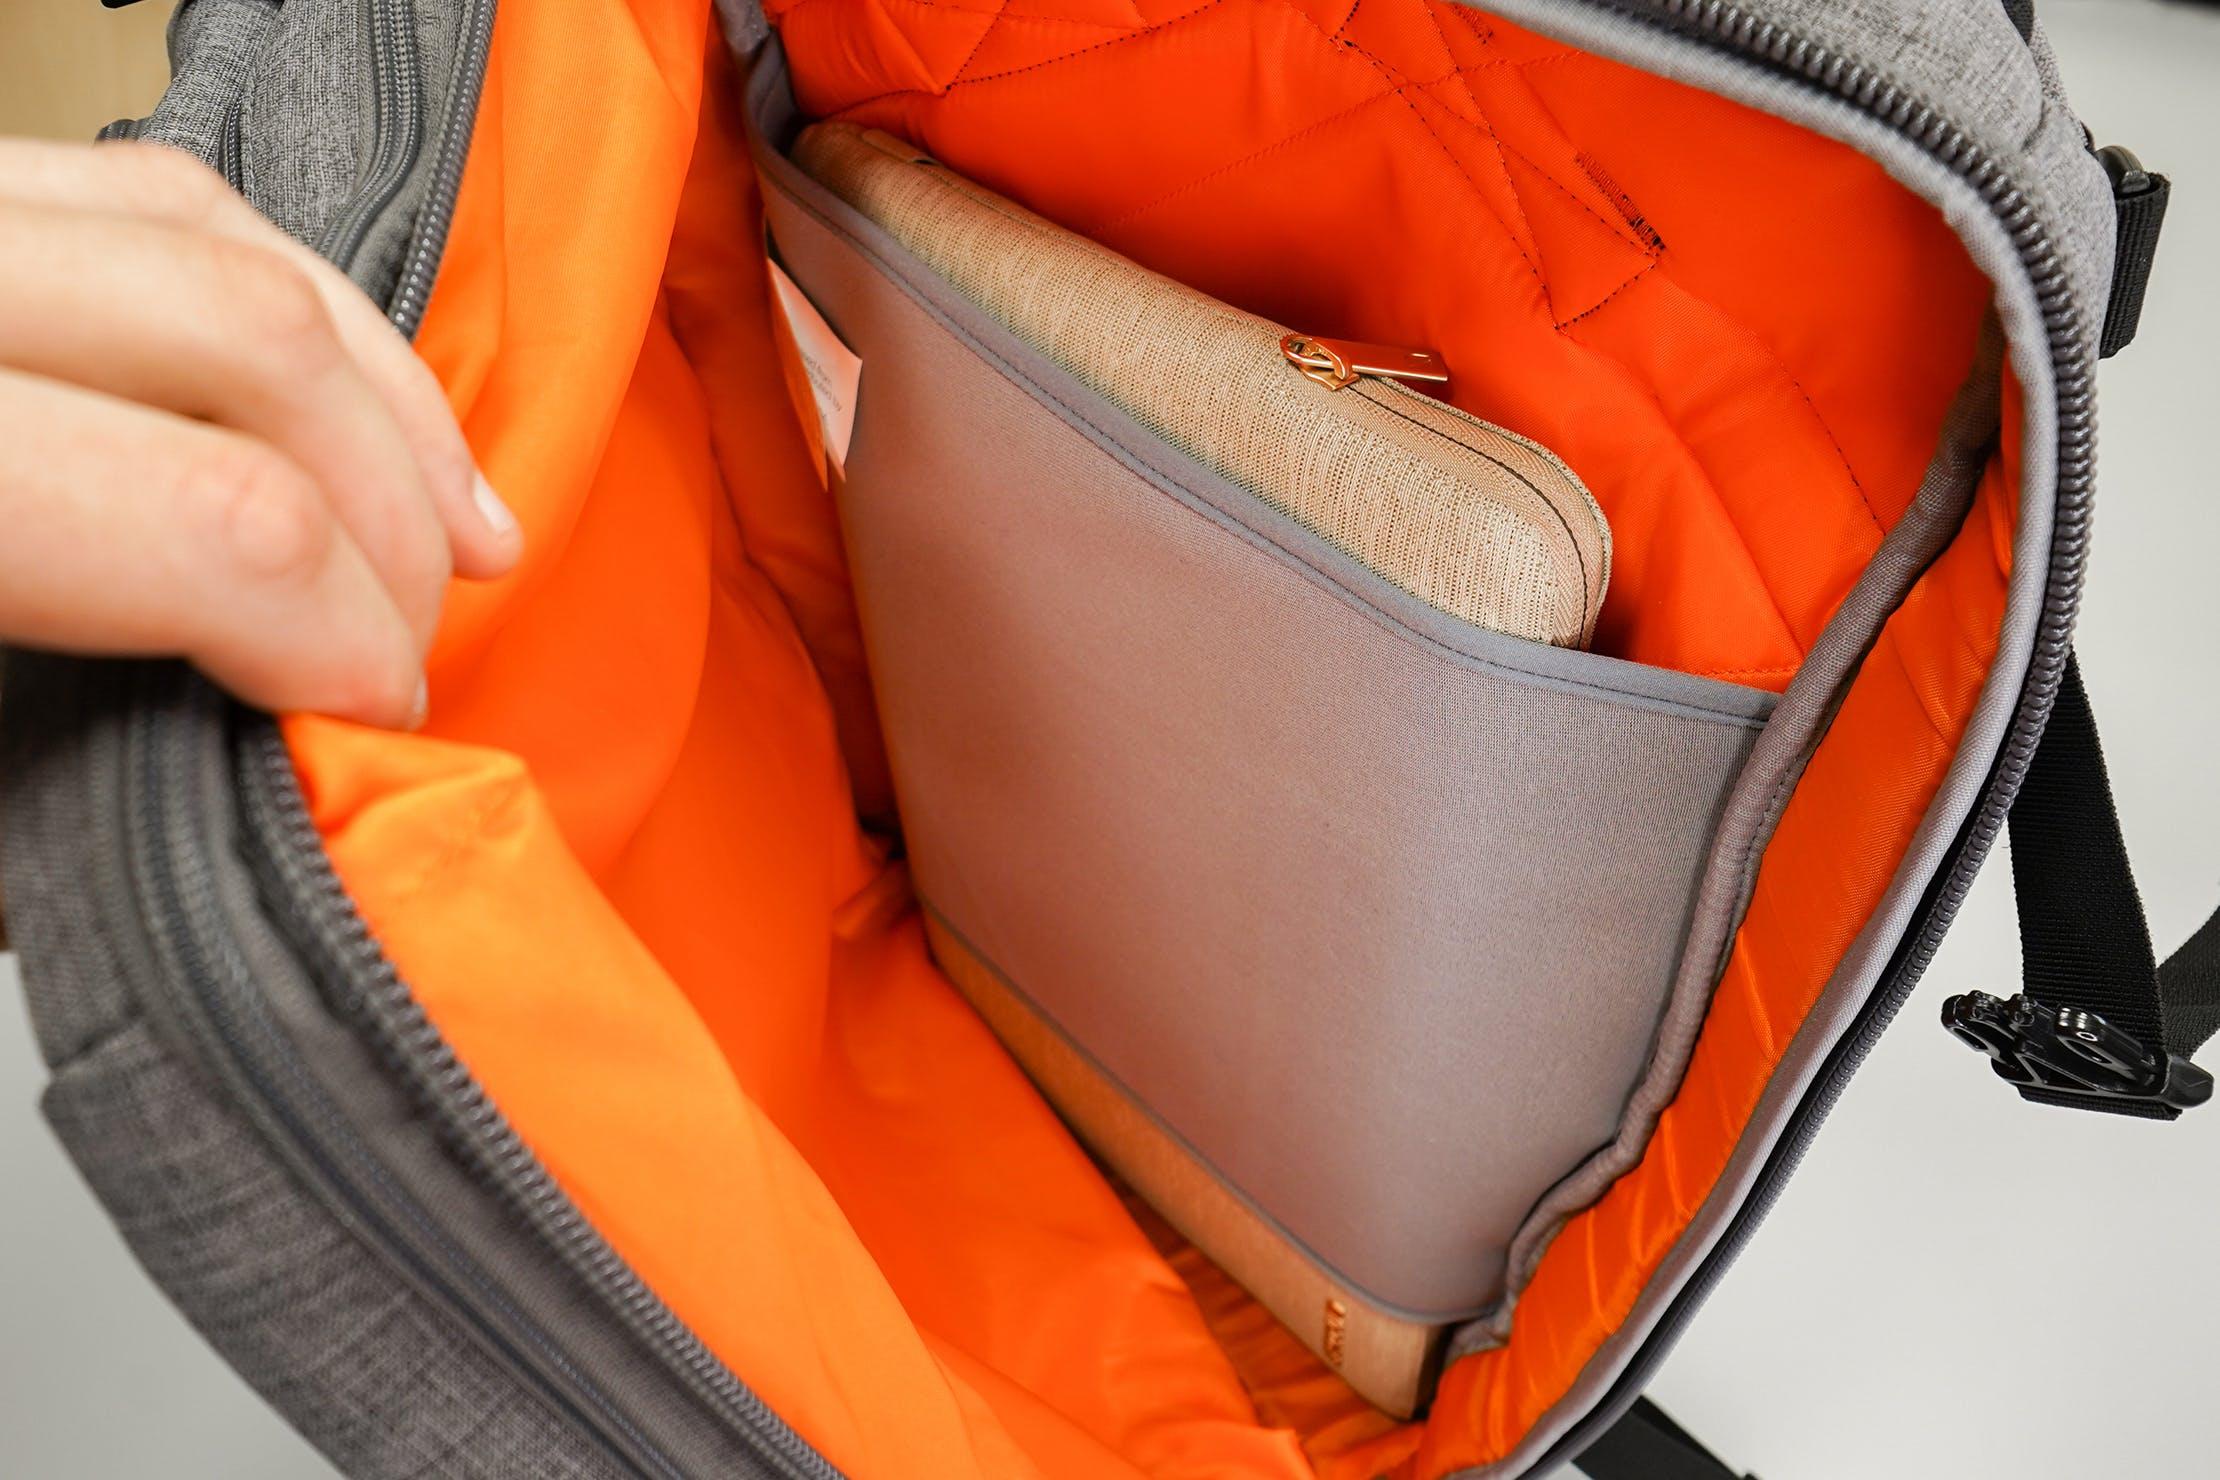 AmazonBasics Slim Travel Backpack Weekender Laptop Compartment